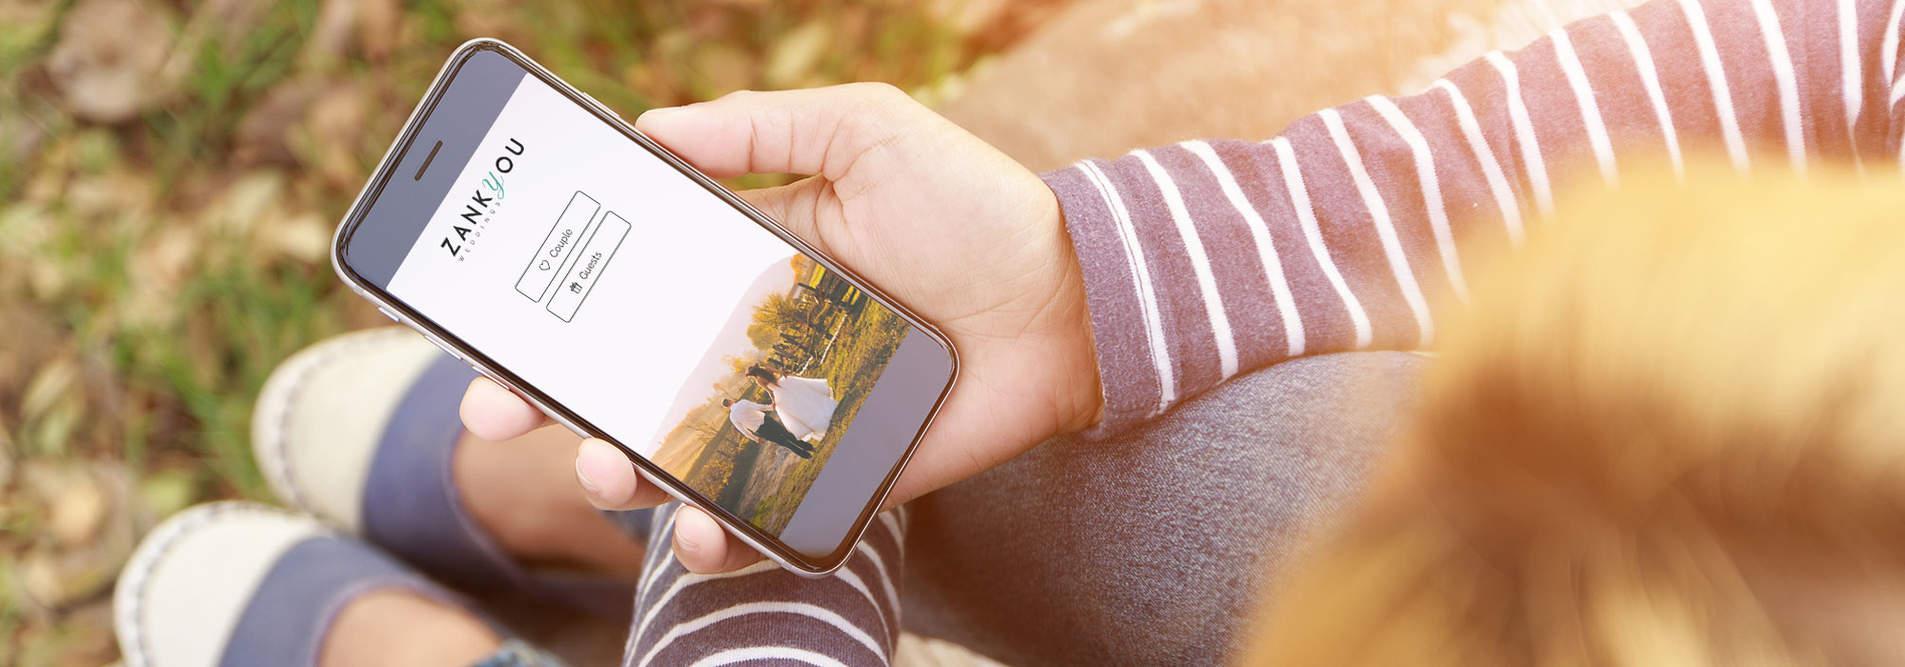 appli iphone android pour votre mariage zankyou - Liste Mariage Zankyou